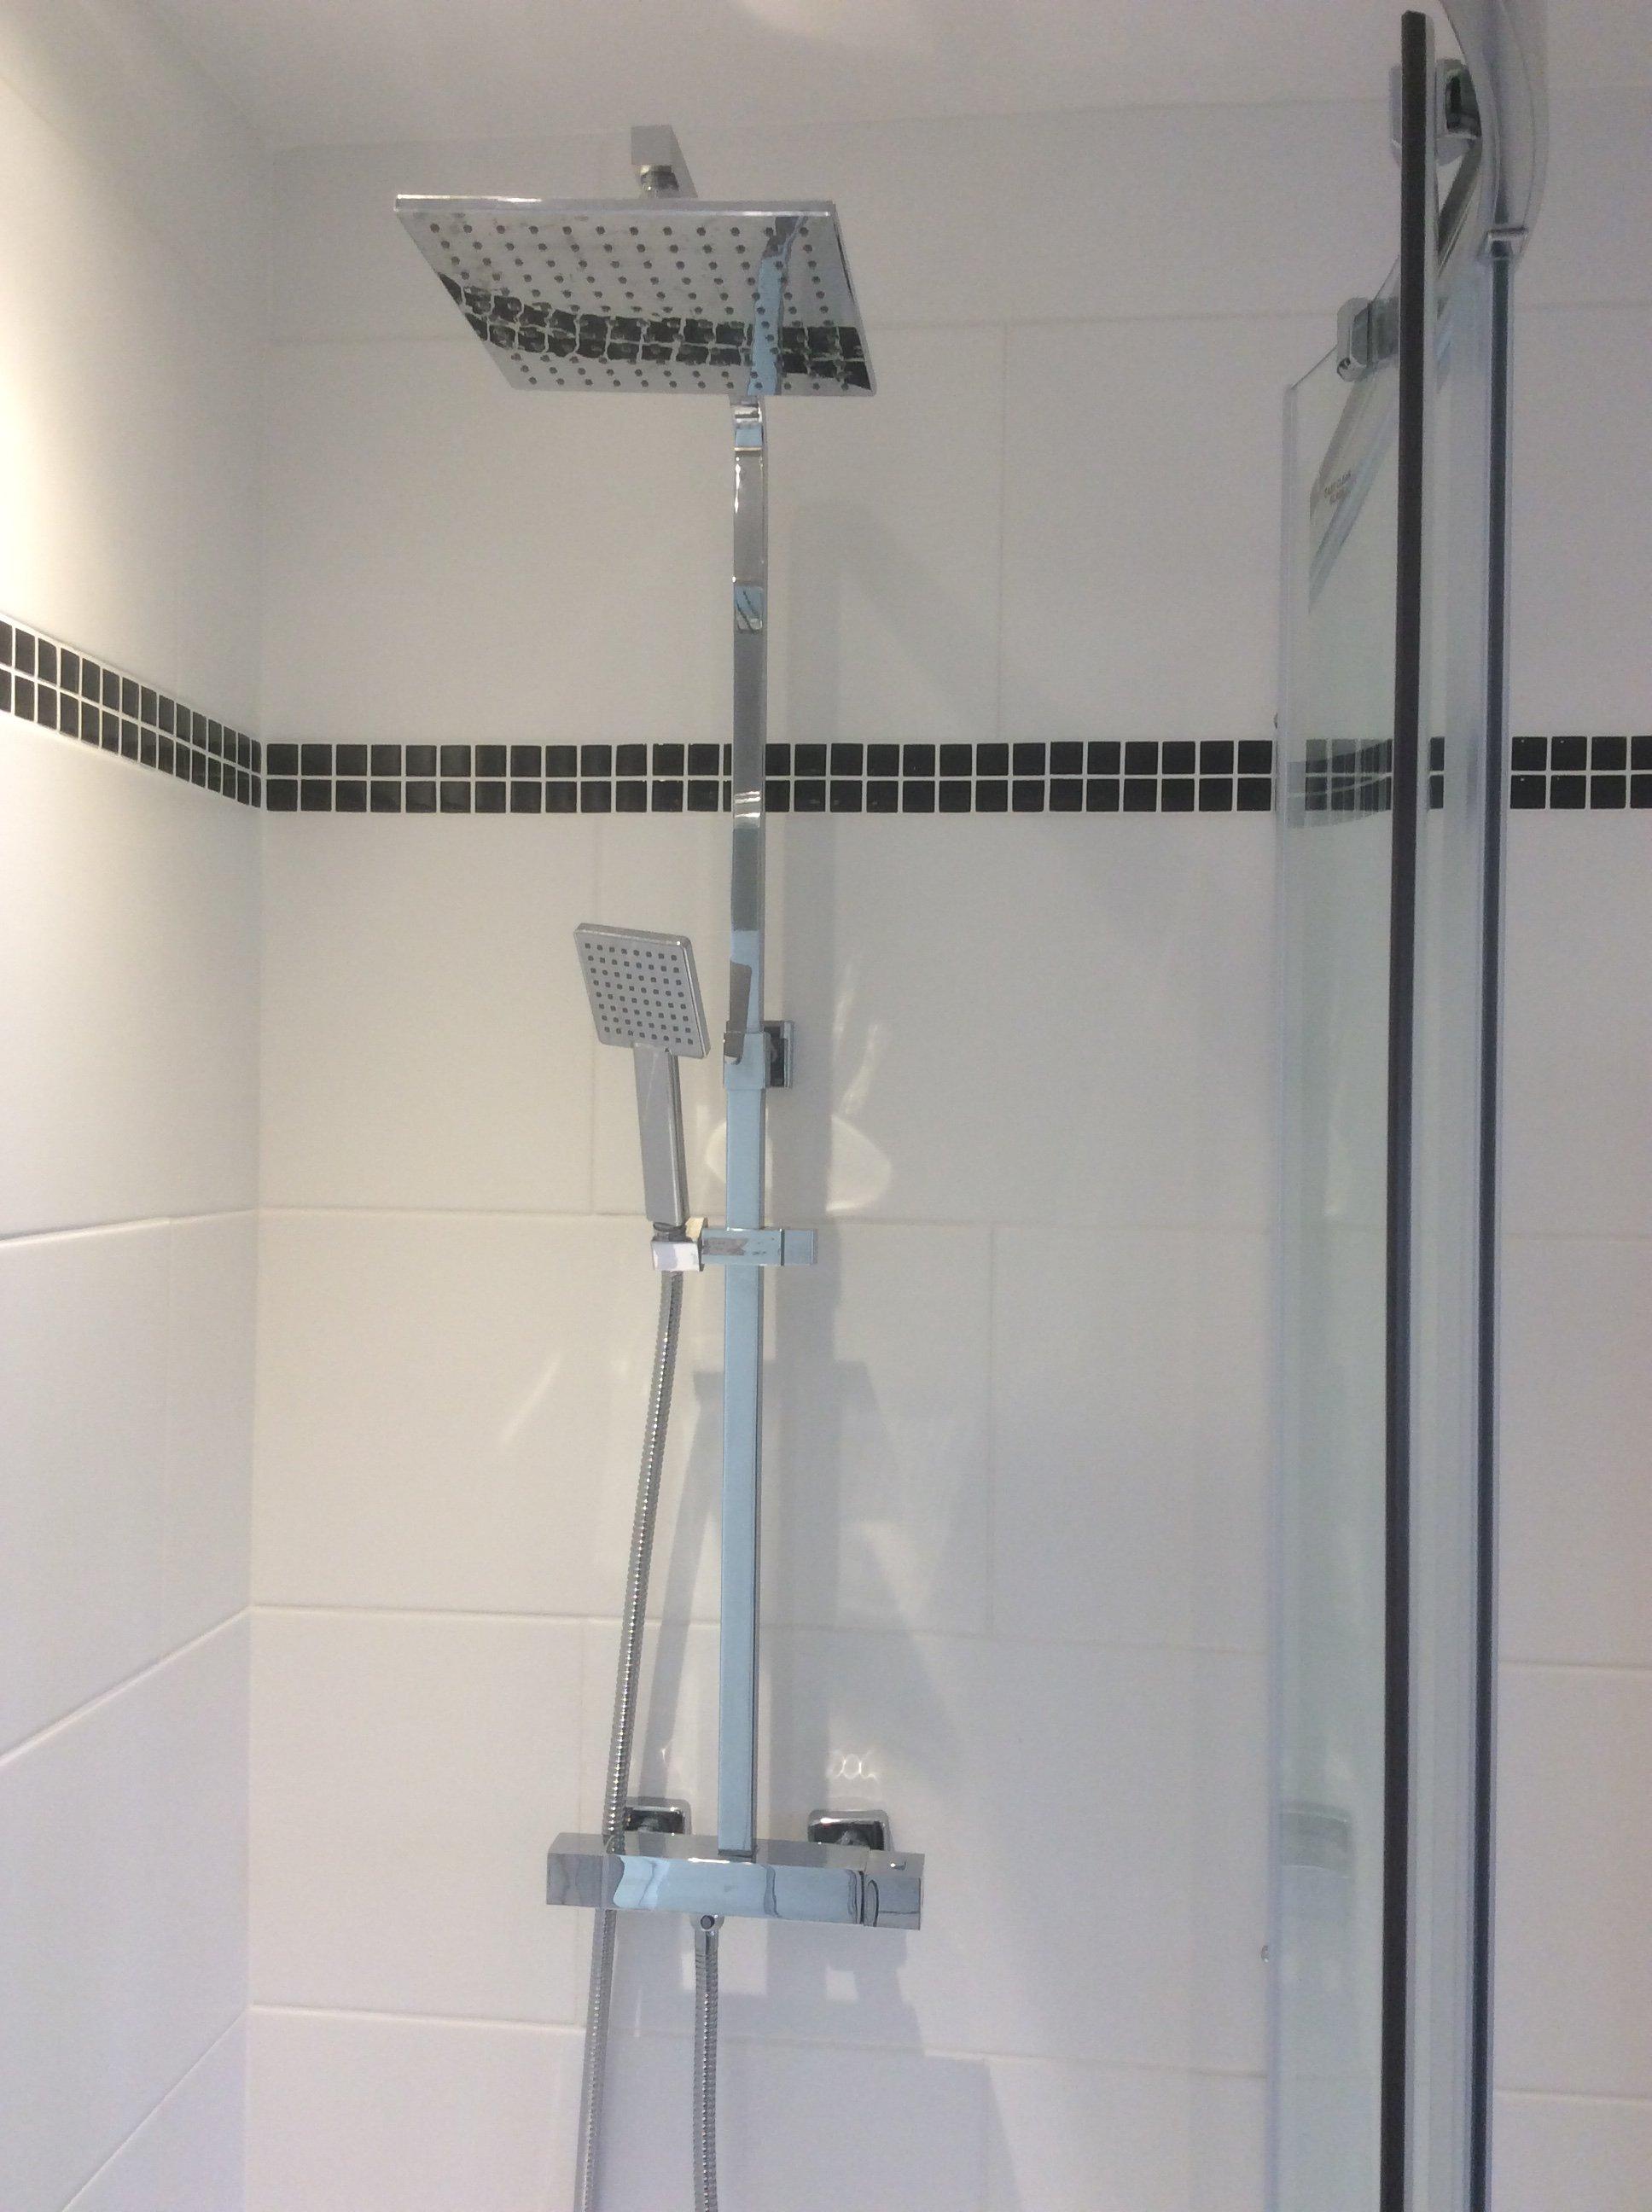 Bathroom Fitting Experts Based In Berkhamsted, Hertfordshire